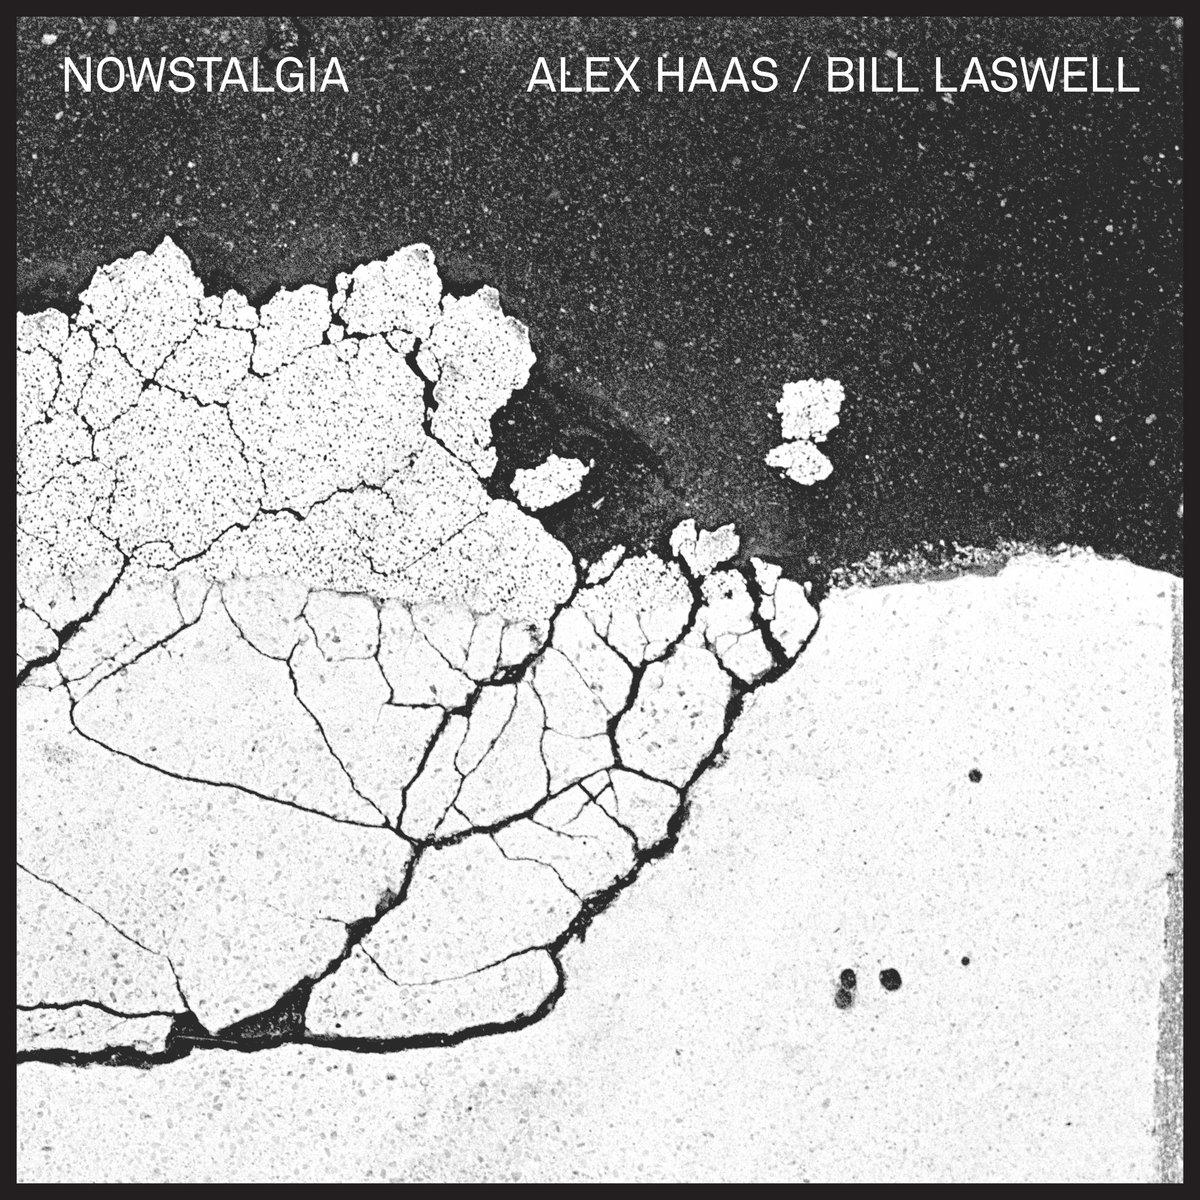 By Alex Haas / Bill Laswell